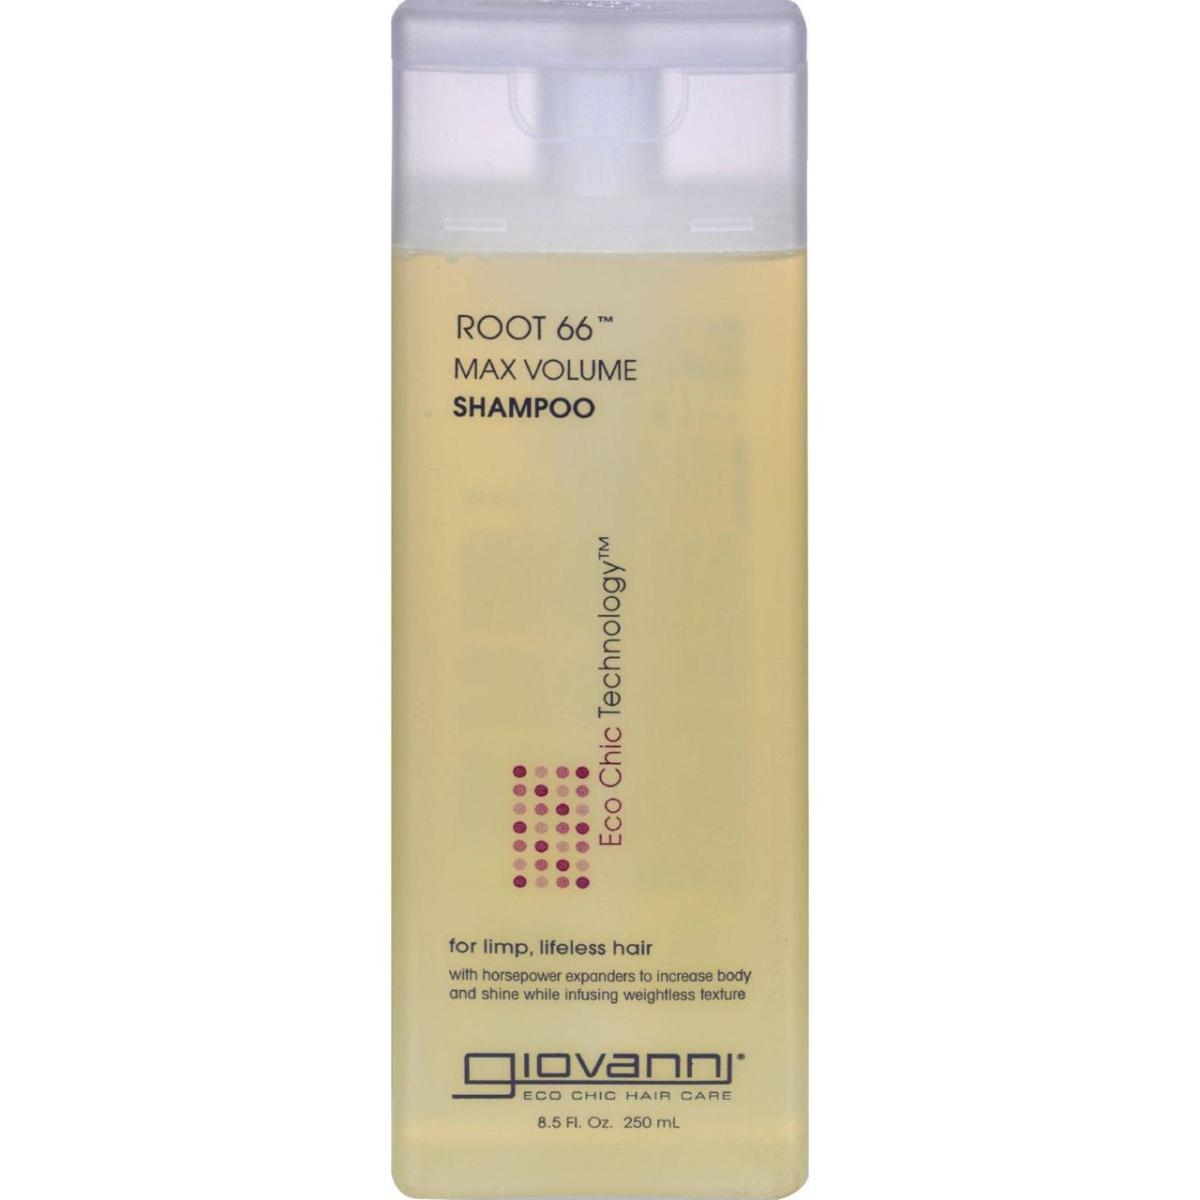 Giovanni Hair Care Products HG0217042 8.5 fl oz Root 66 Max Volume Shampoo